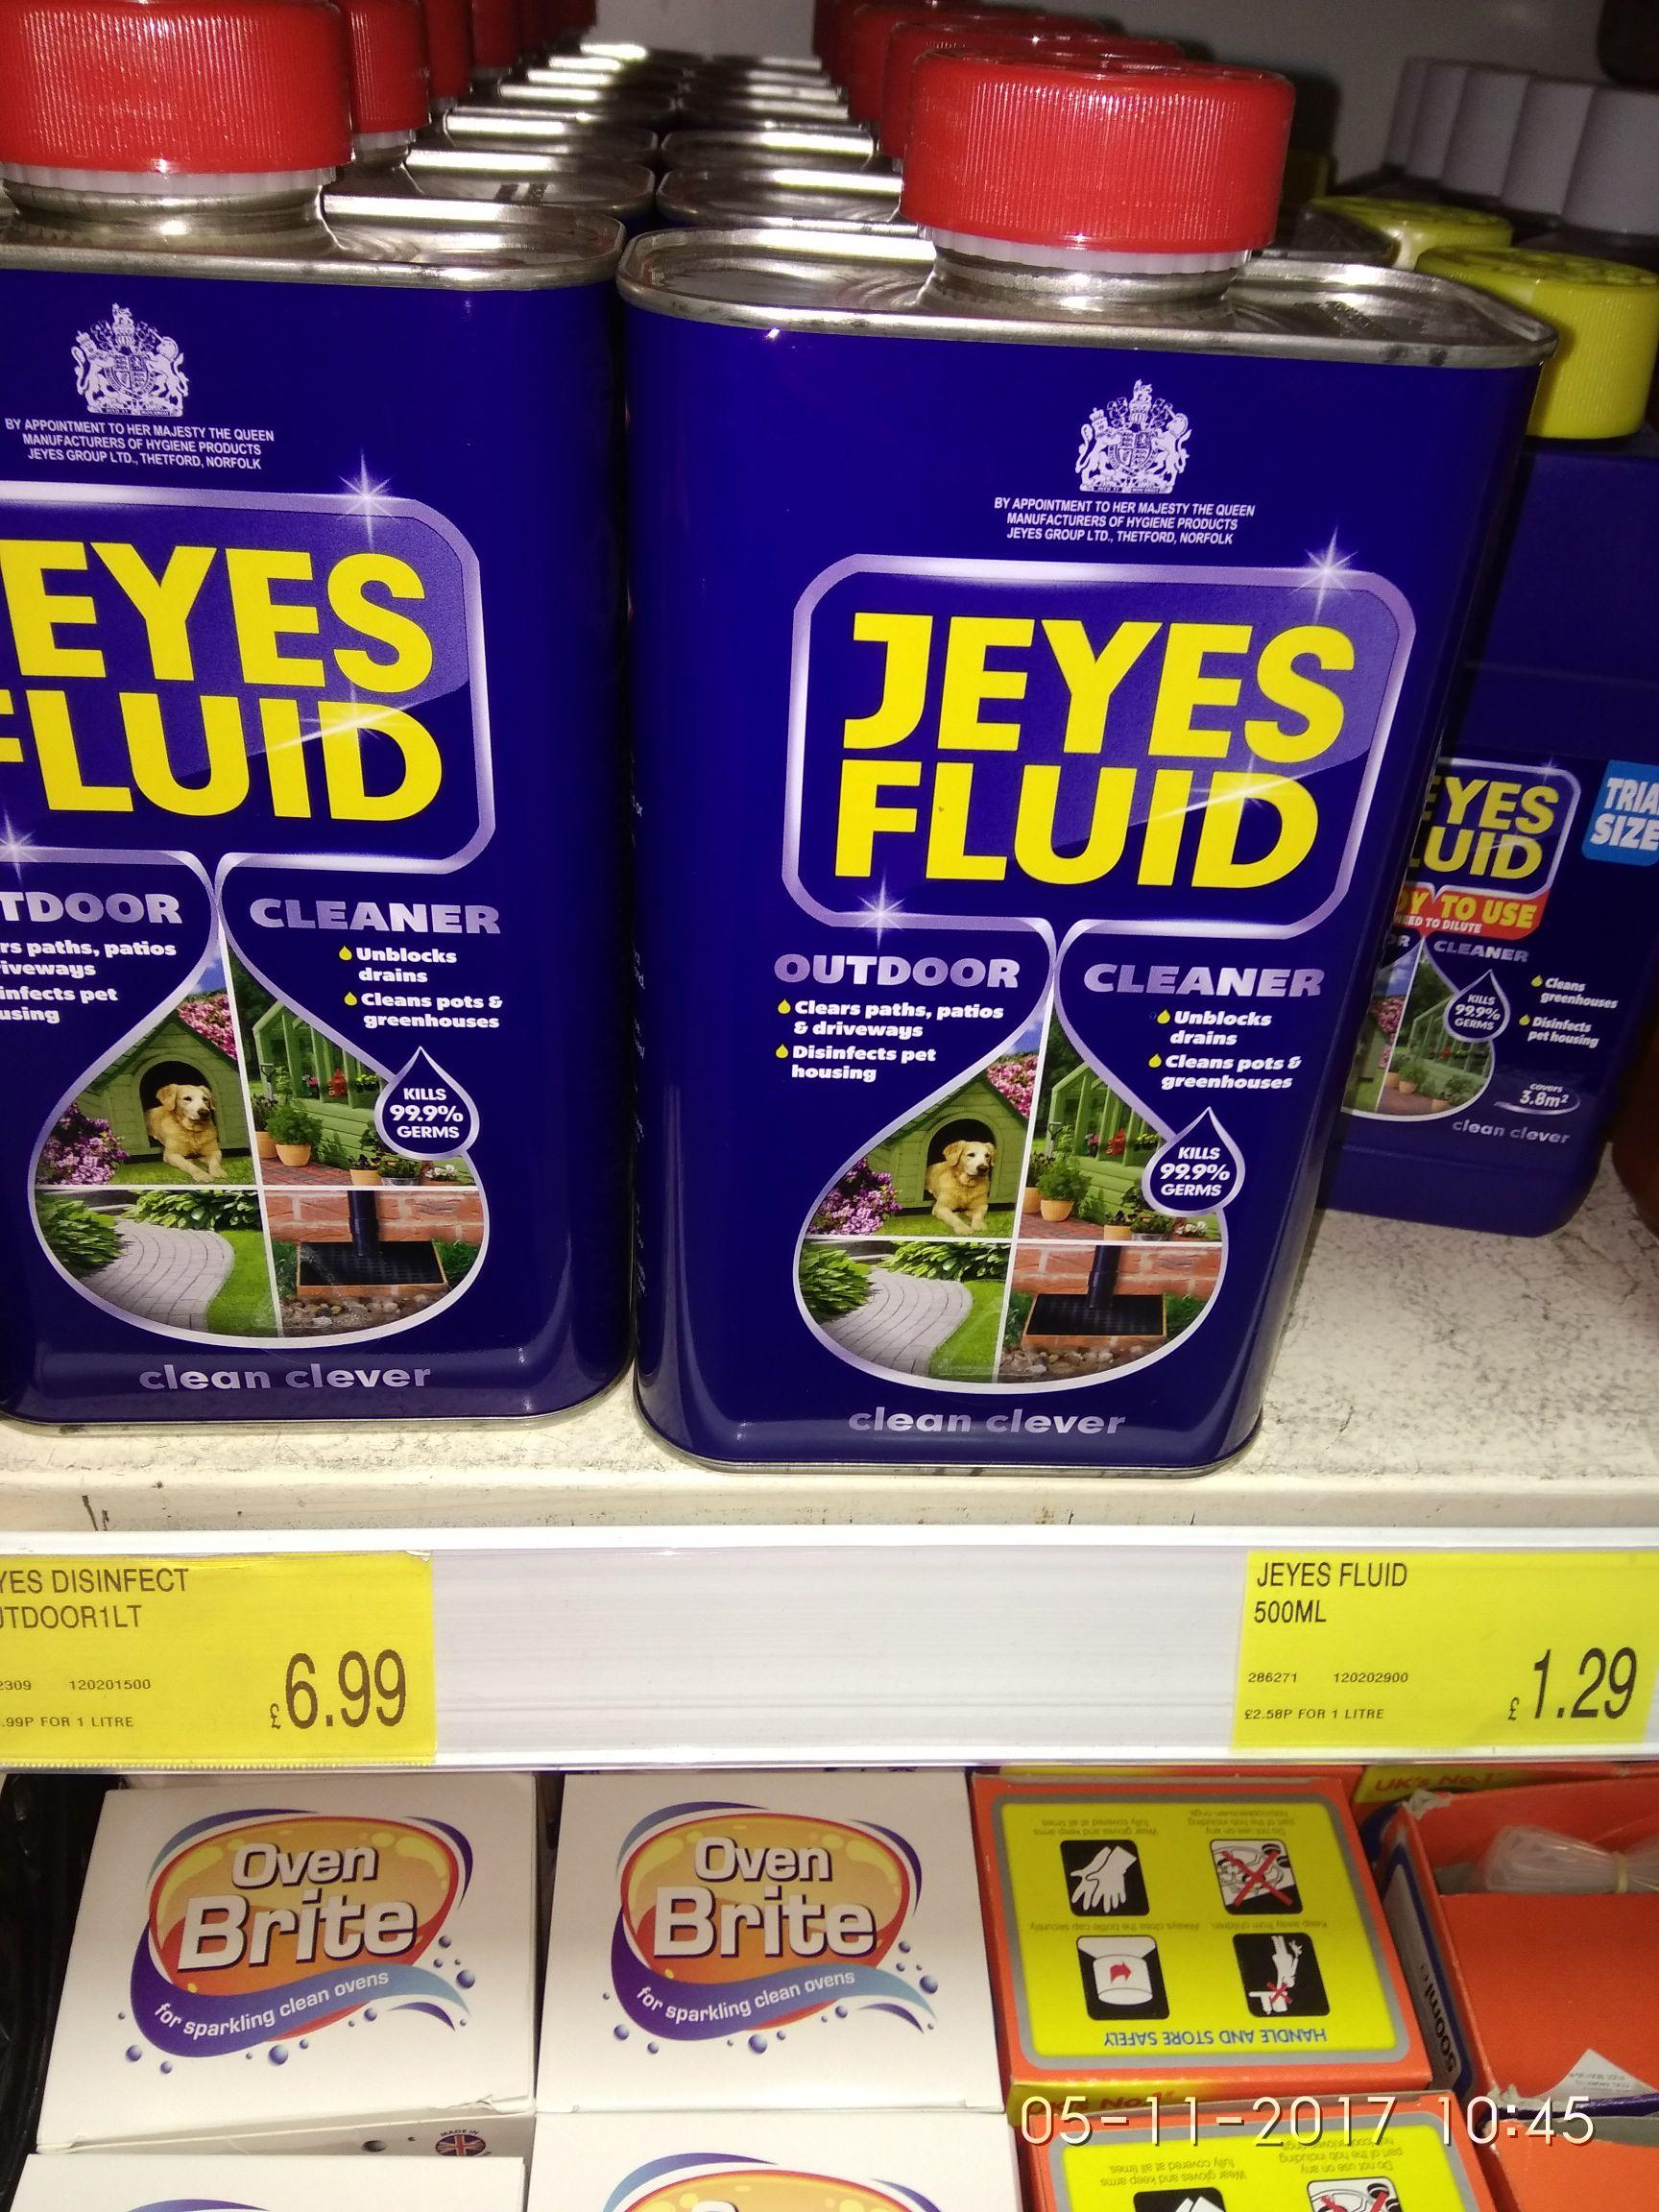 Jeyes fluid 500ml - £1.29 instore @ B&M